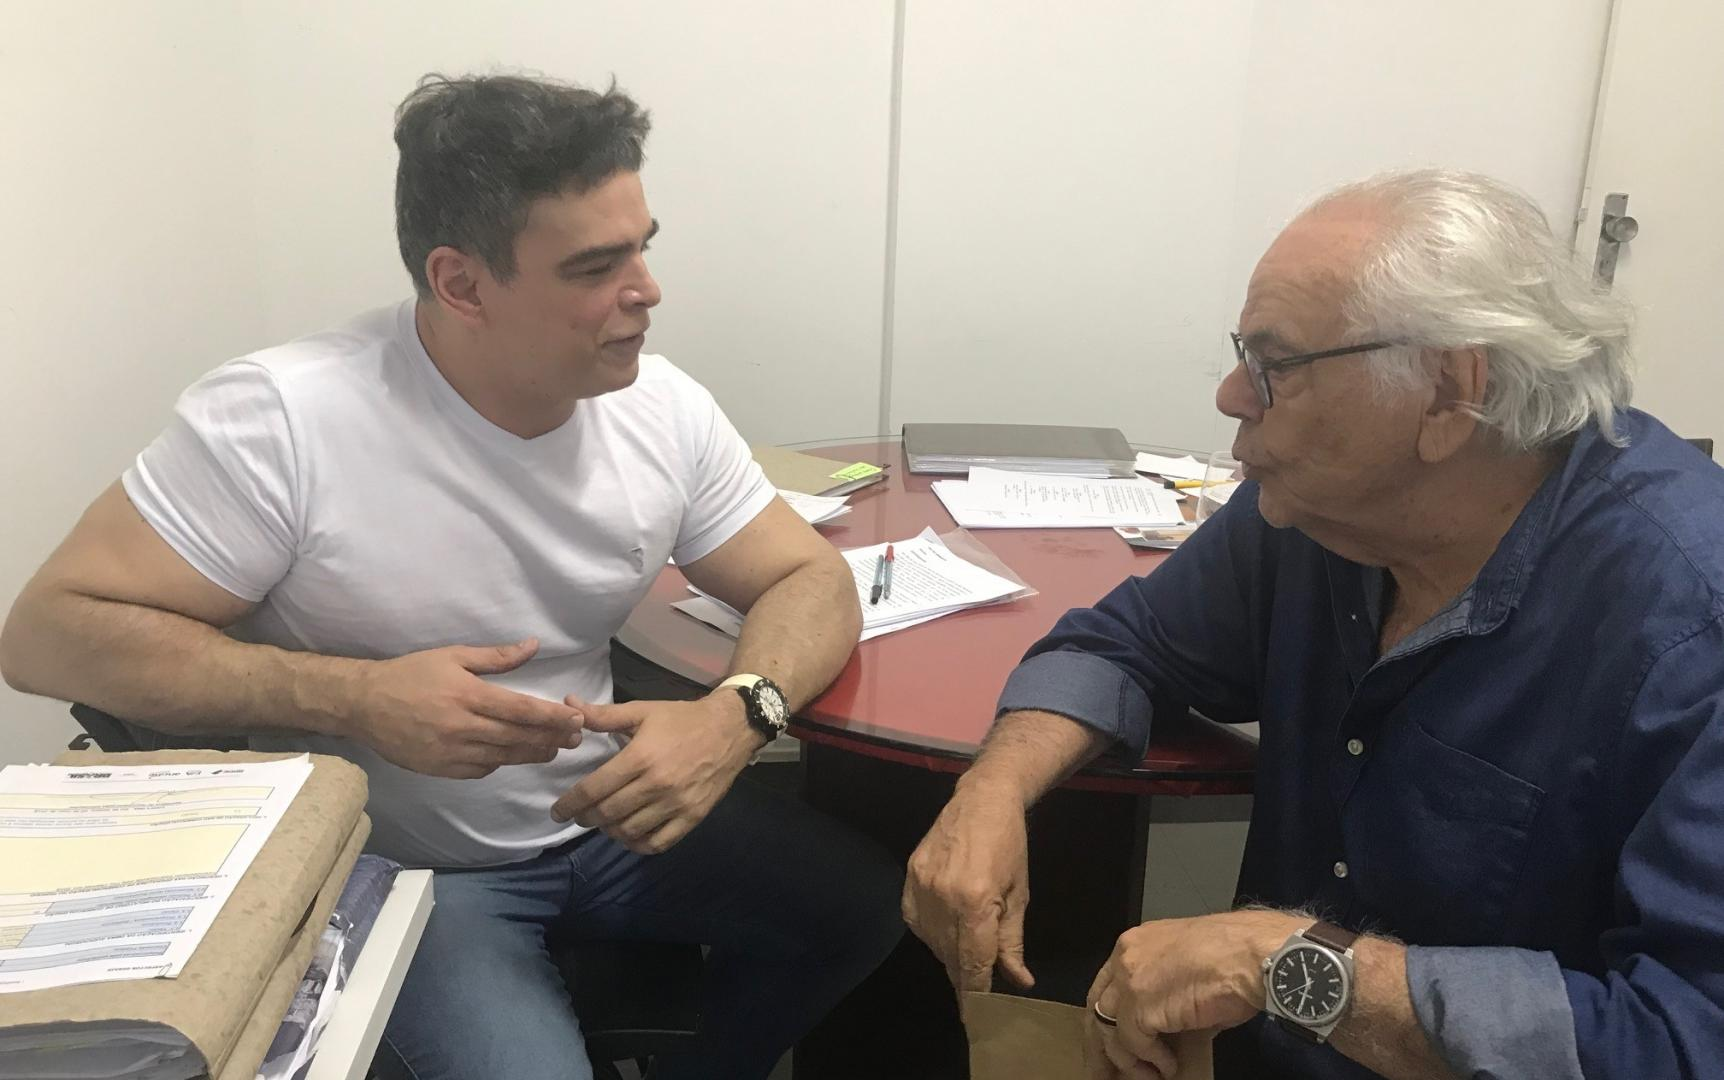 Zelito Viana e Marcelo Caetano